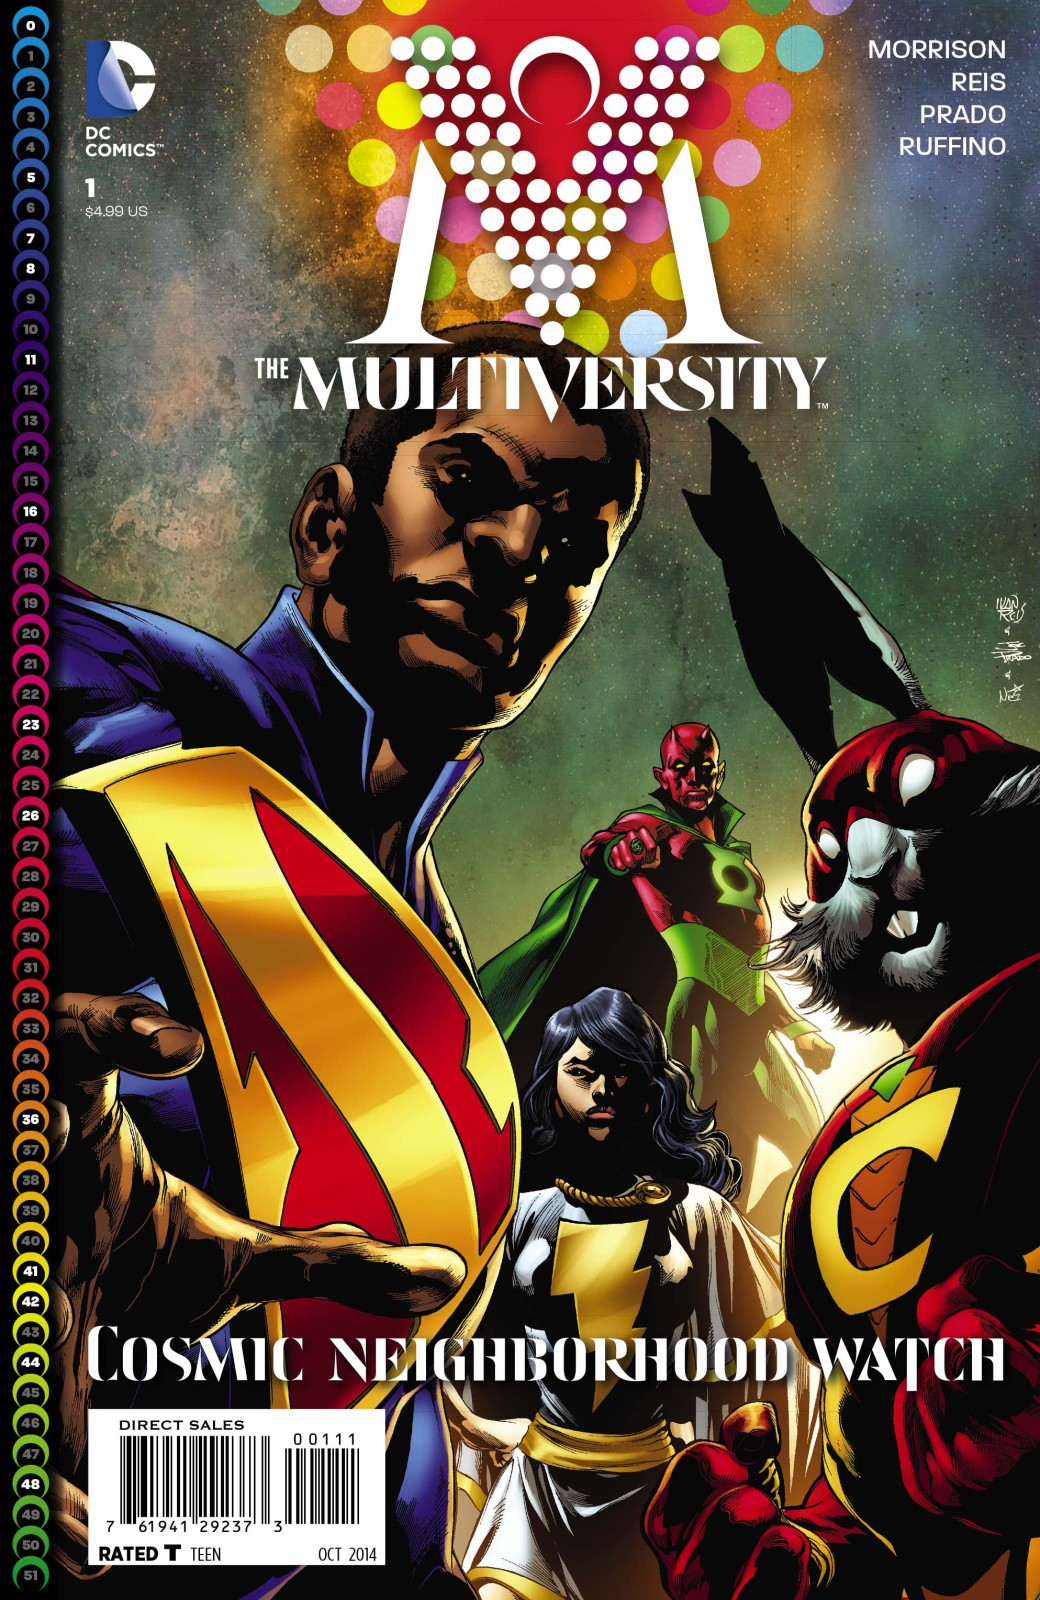 Multiversity #1 review